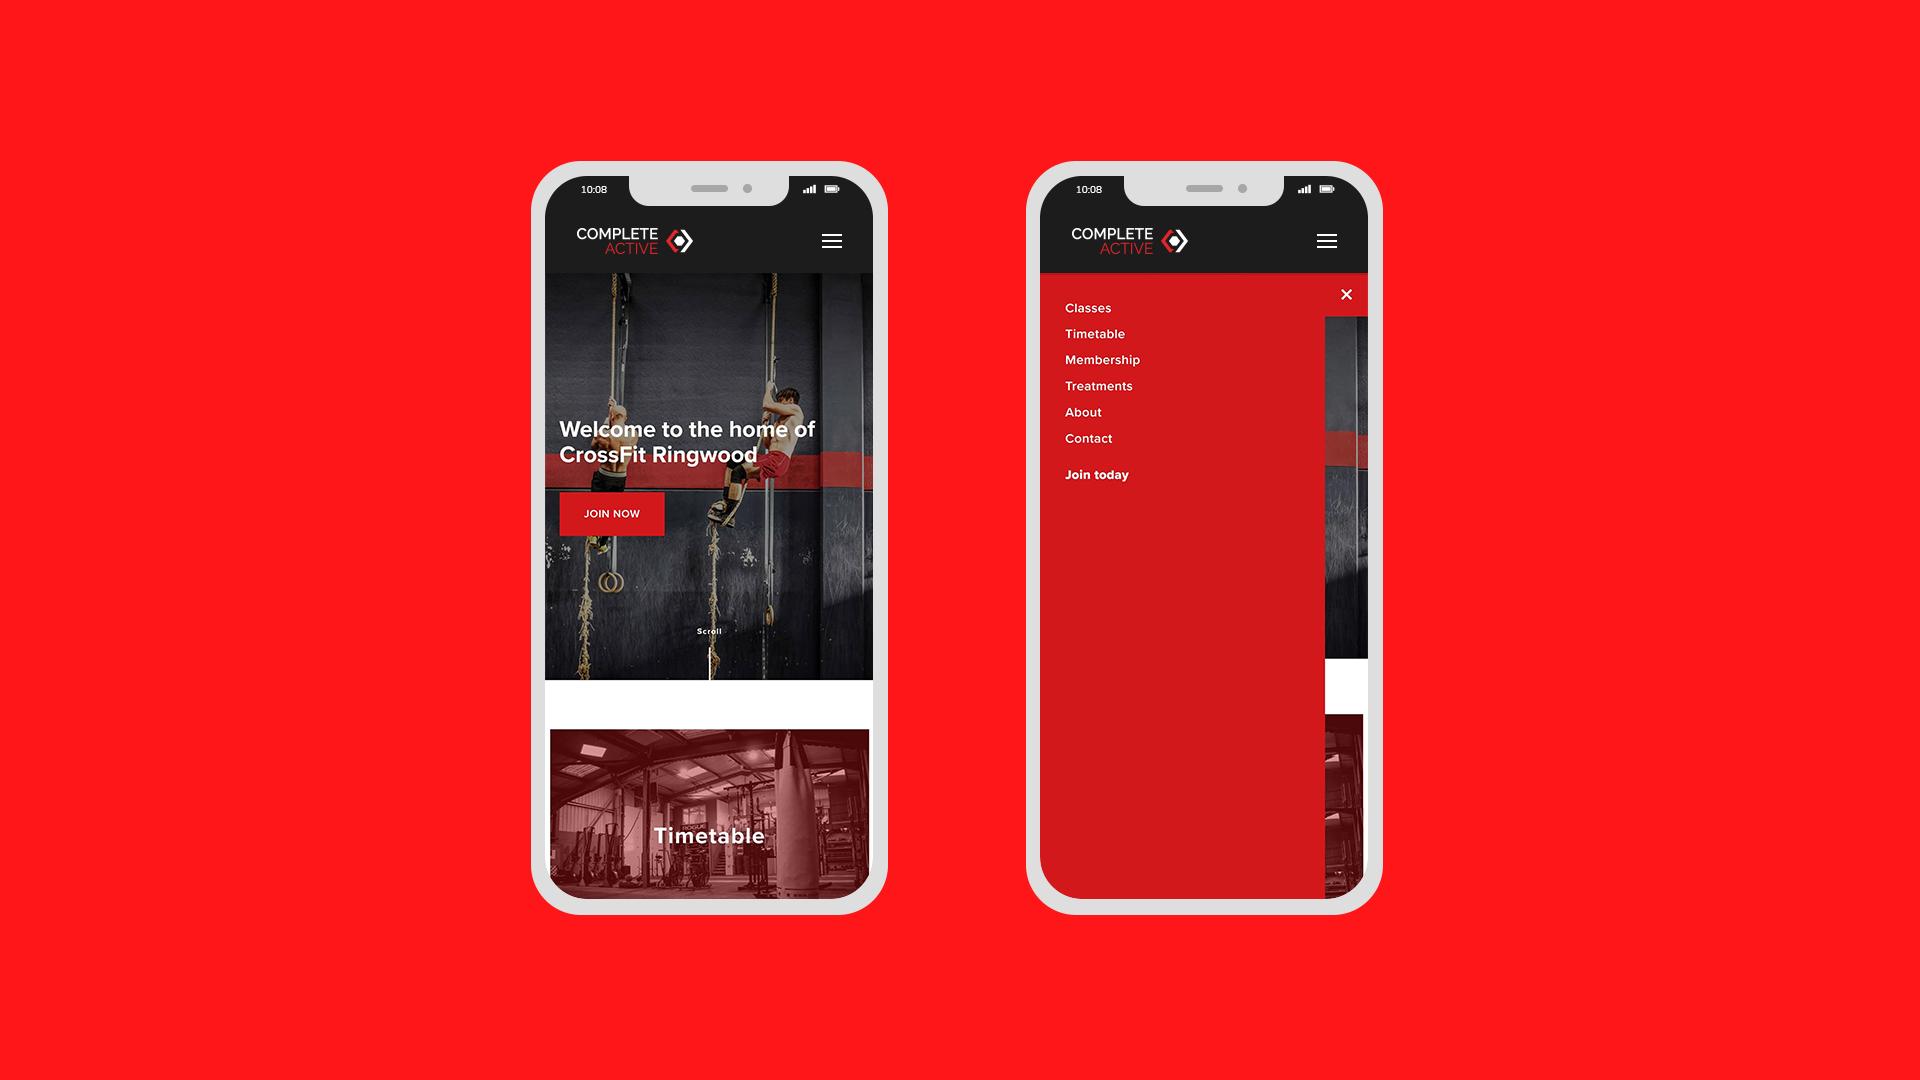 04-Lobo-Creative-Complete-Active-digital-website-design-development-in-Bournemouth.jpg